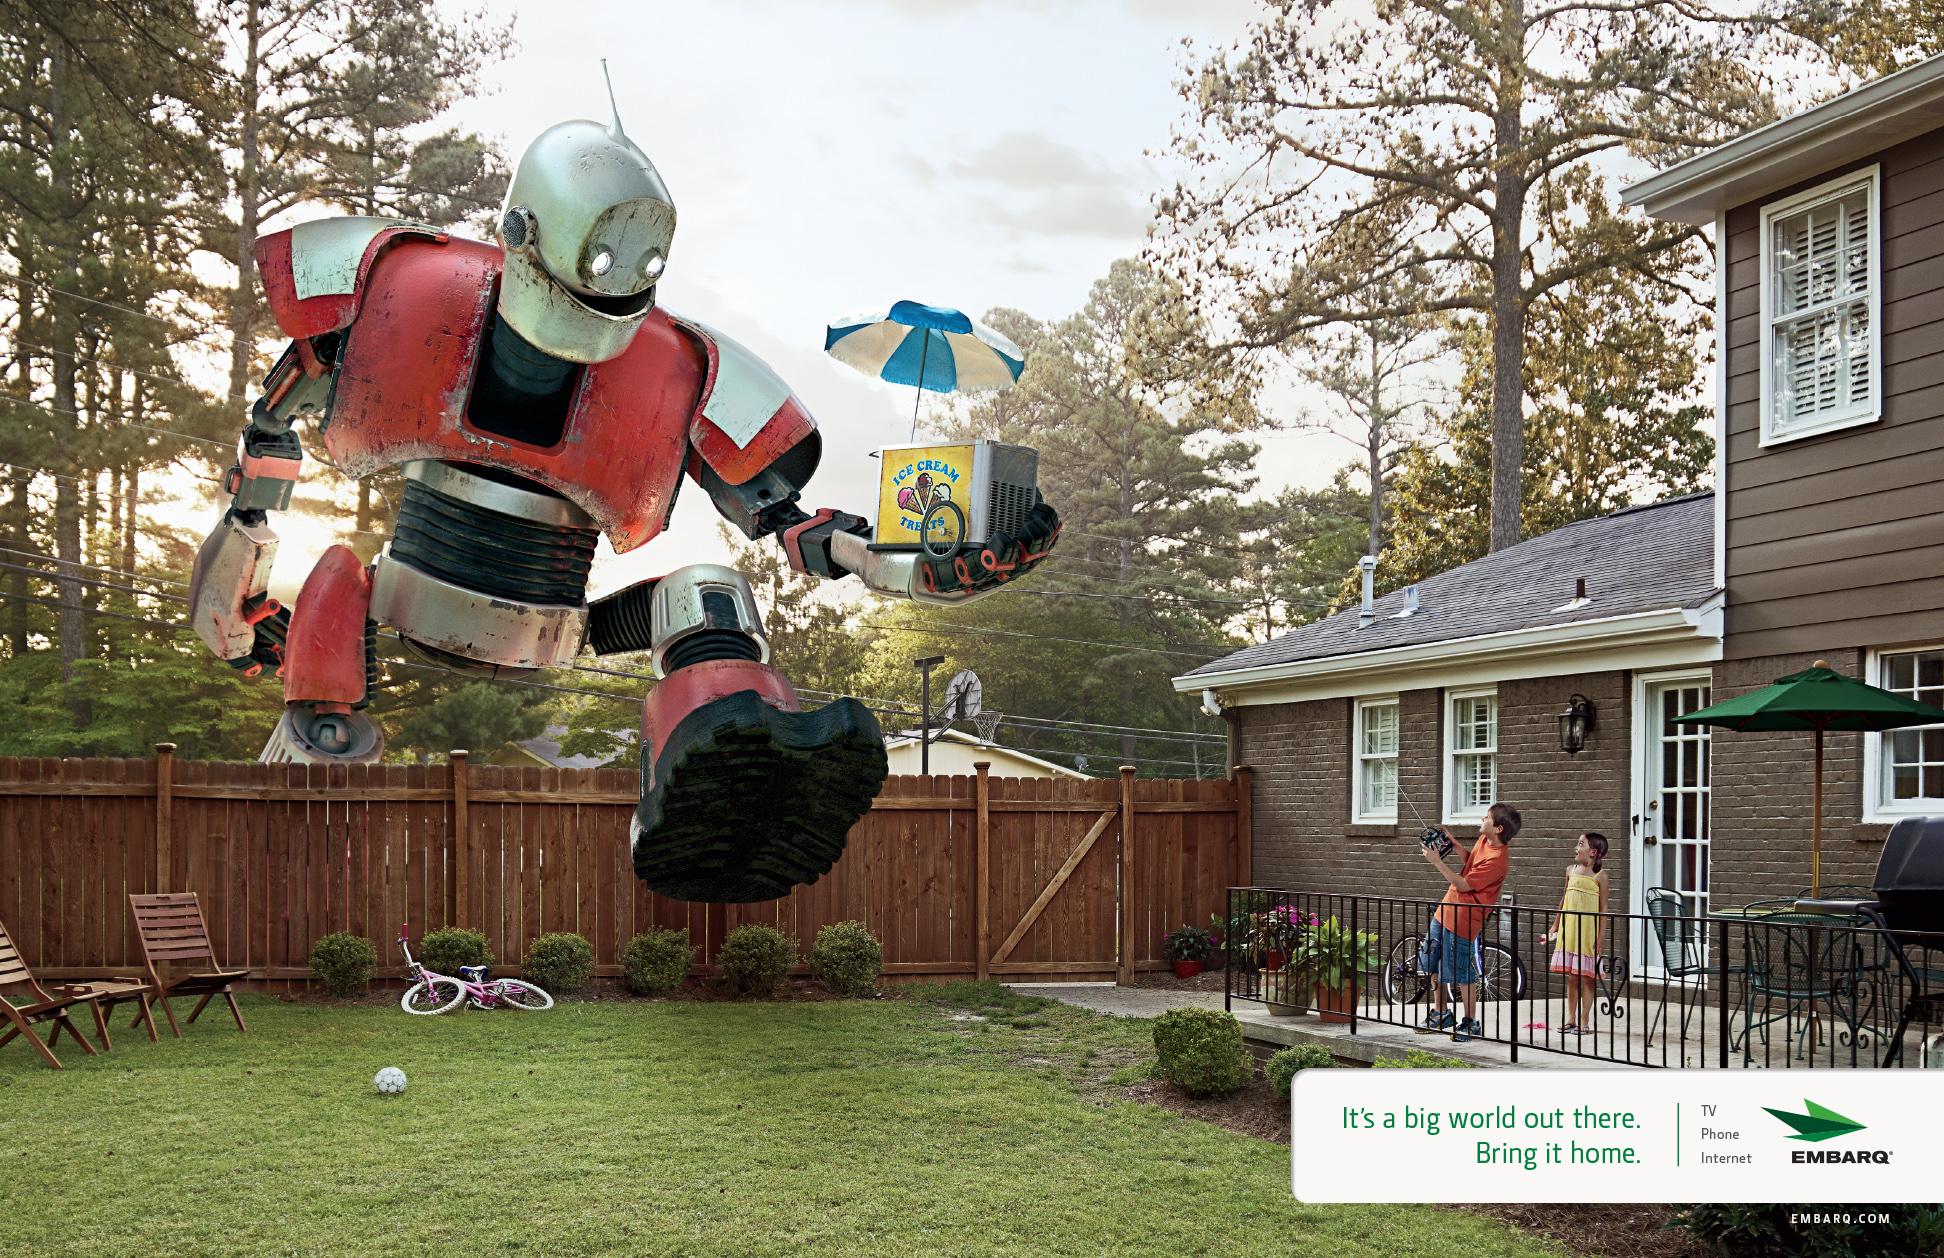 Ice Cream Delivery Robot